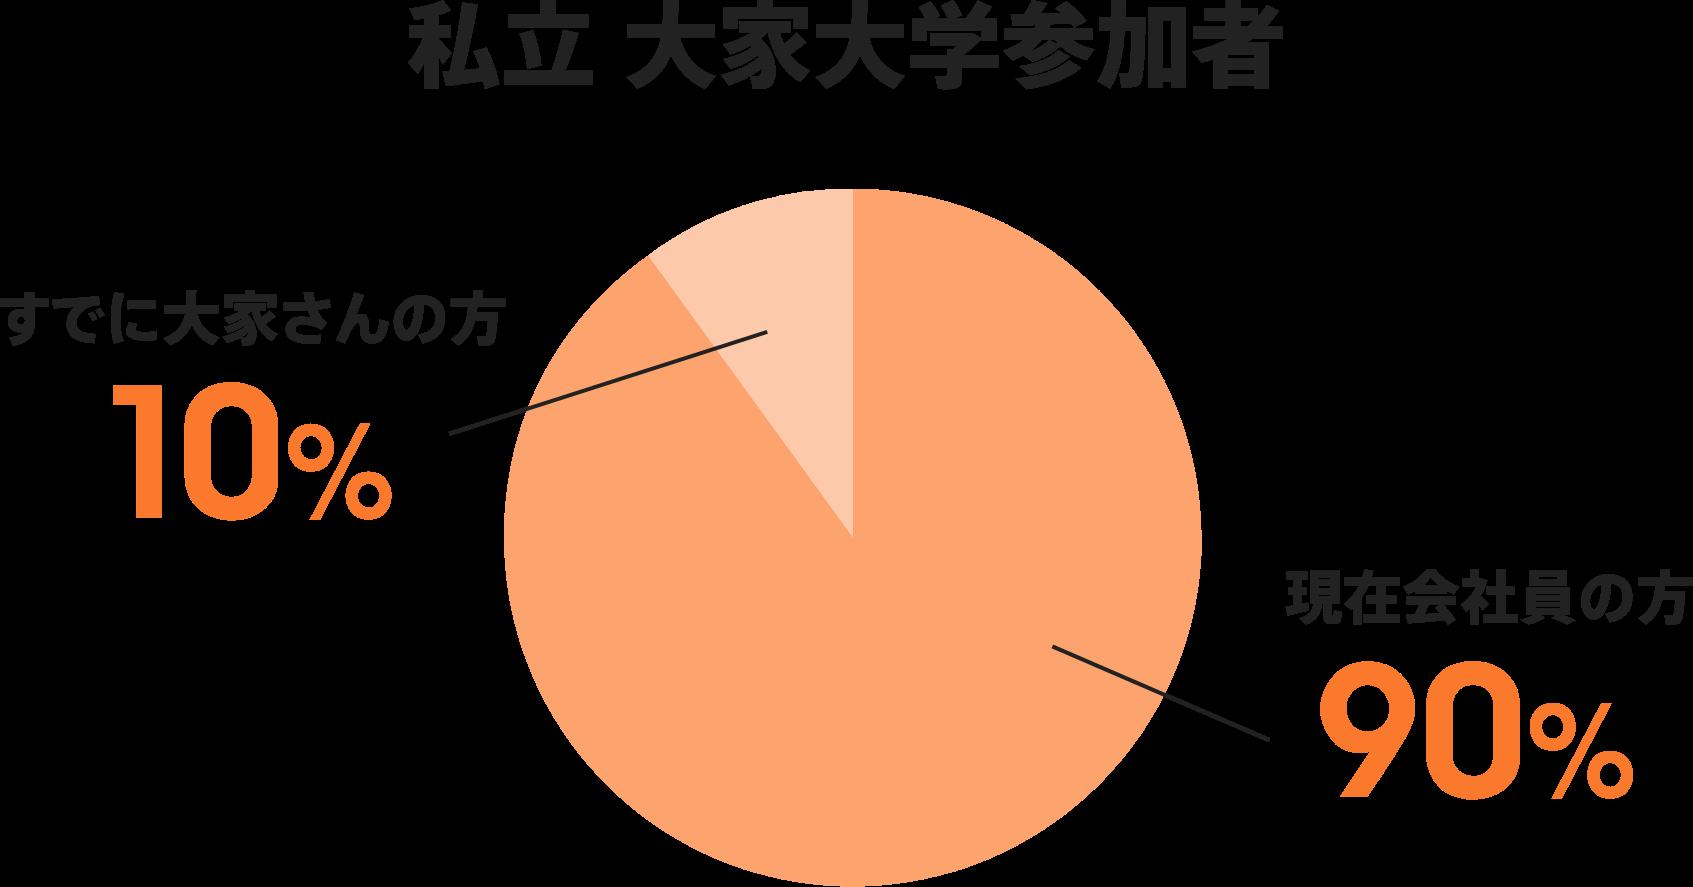 私立 大家大学参加者:現在会社員の方が90%